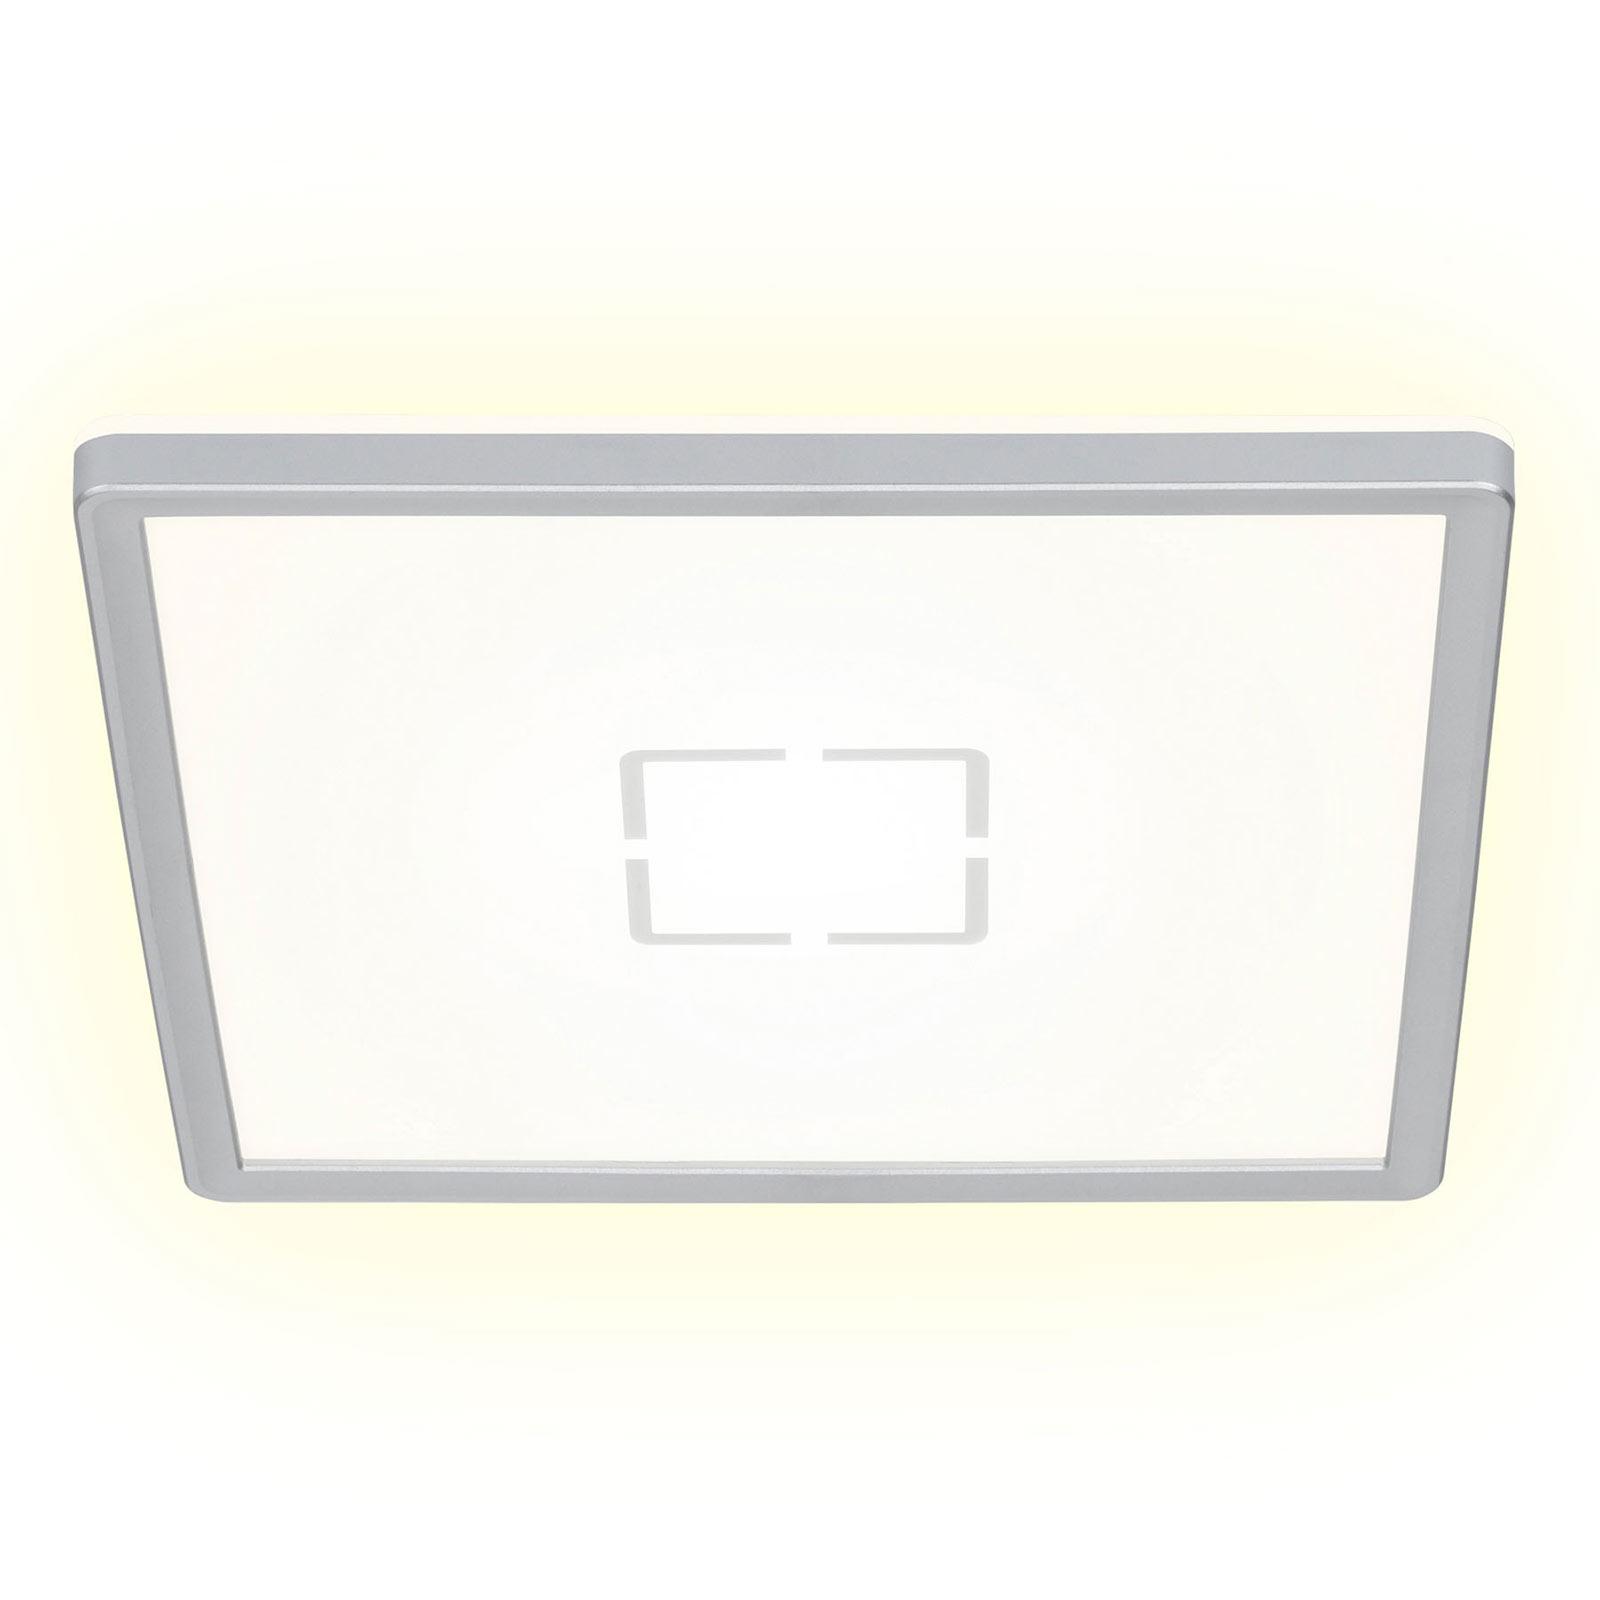 LED-Deckenlampe Free, 29 x 29 cm, silber